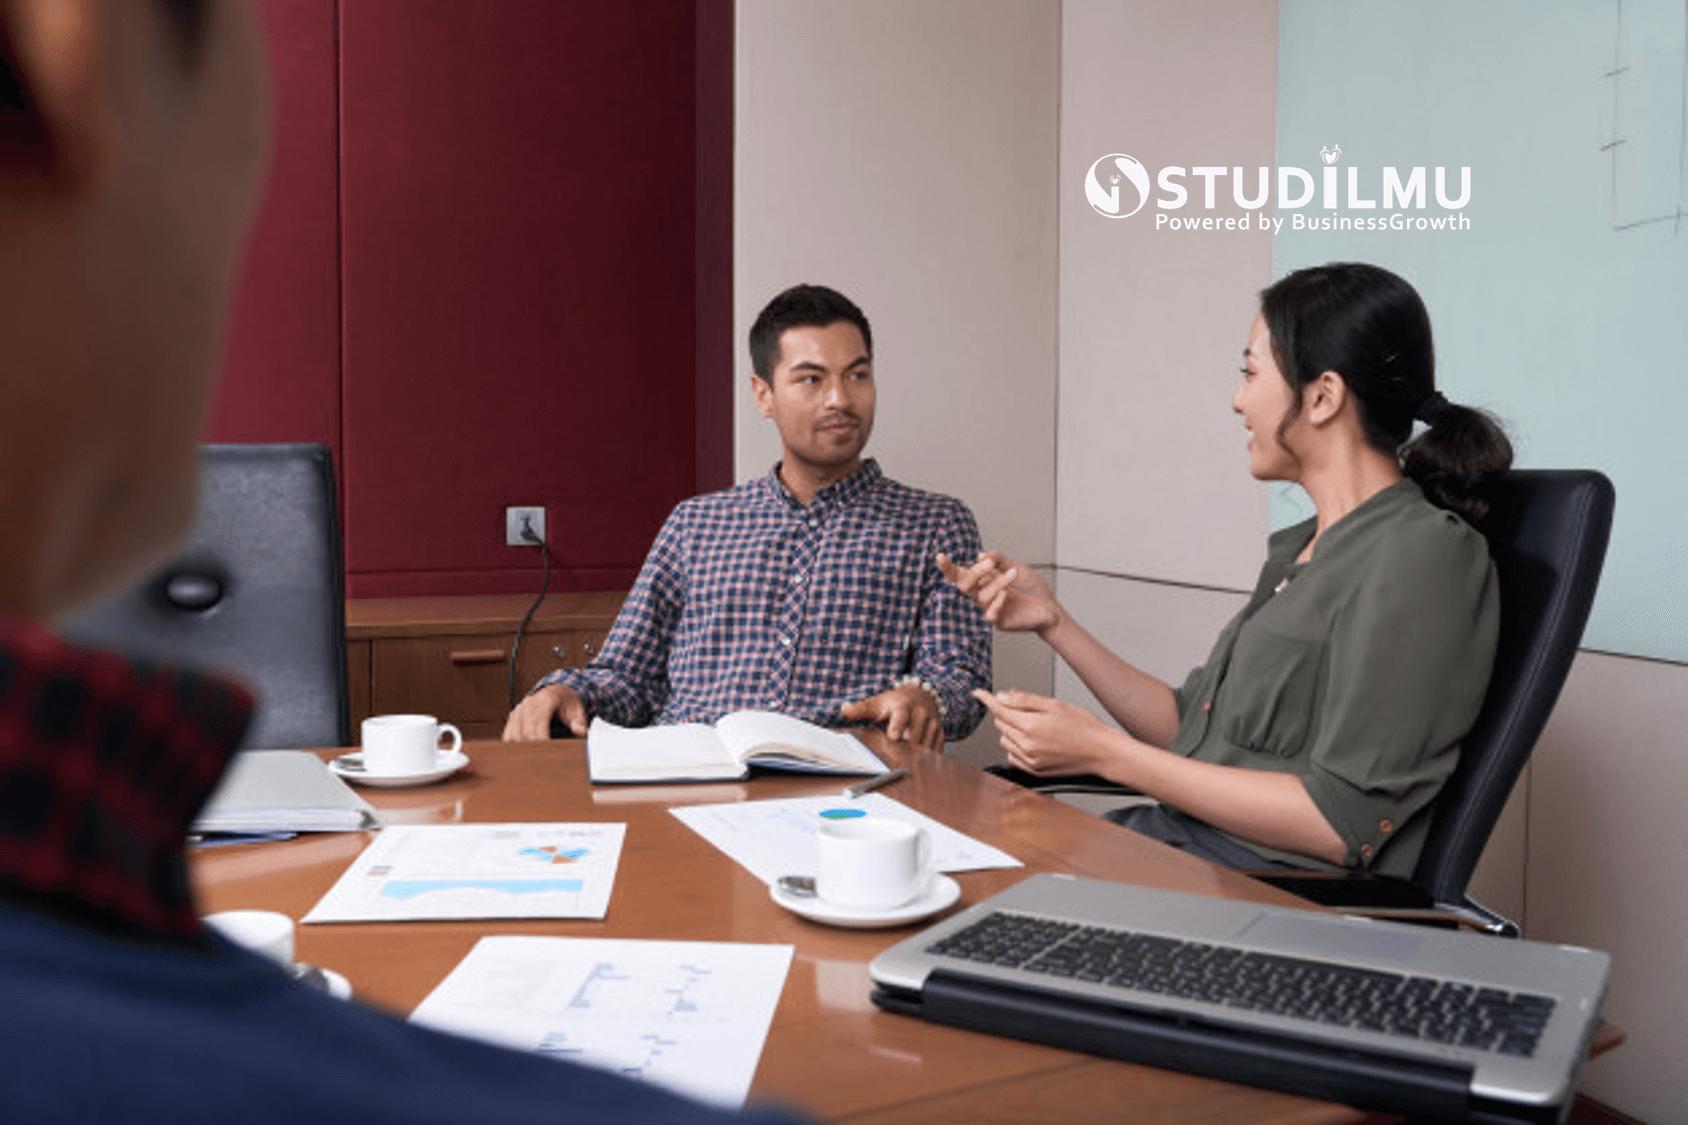 STUDILMU Career Advice - Apa Saja Unsur-Unsur Komunikasi yang Perlu Kita Ketahui?